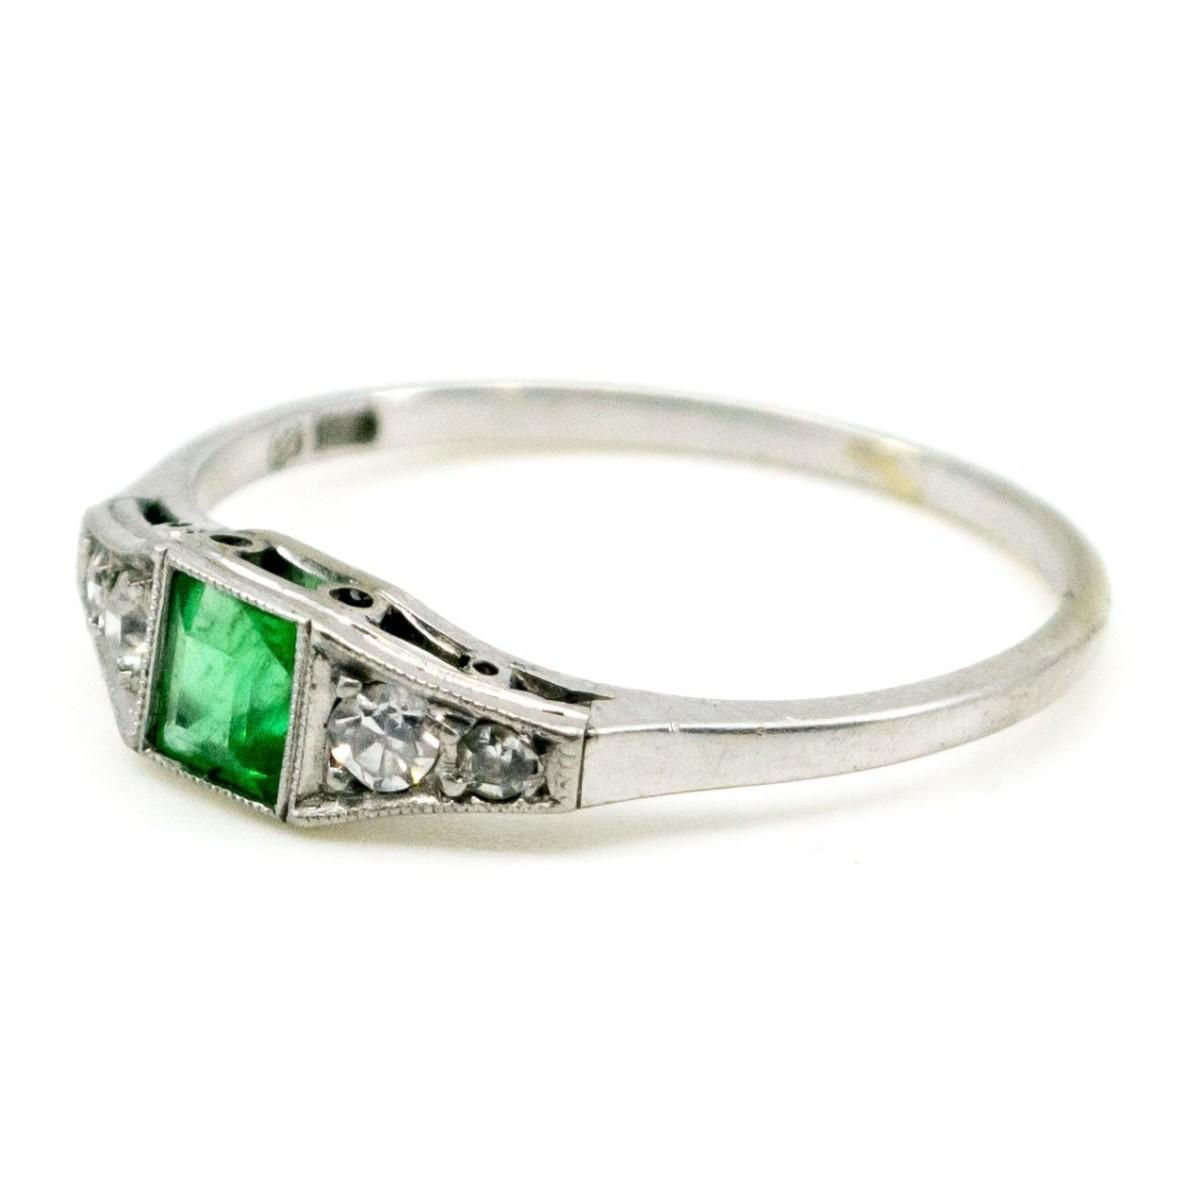 Antique Art Deco Emerald and Diamond Ring — Jewellery ...  Antique Art Dec...